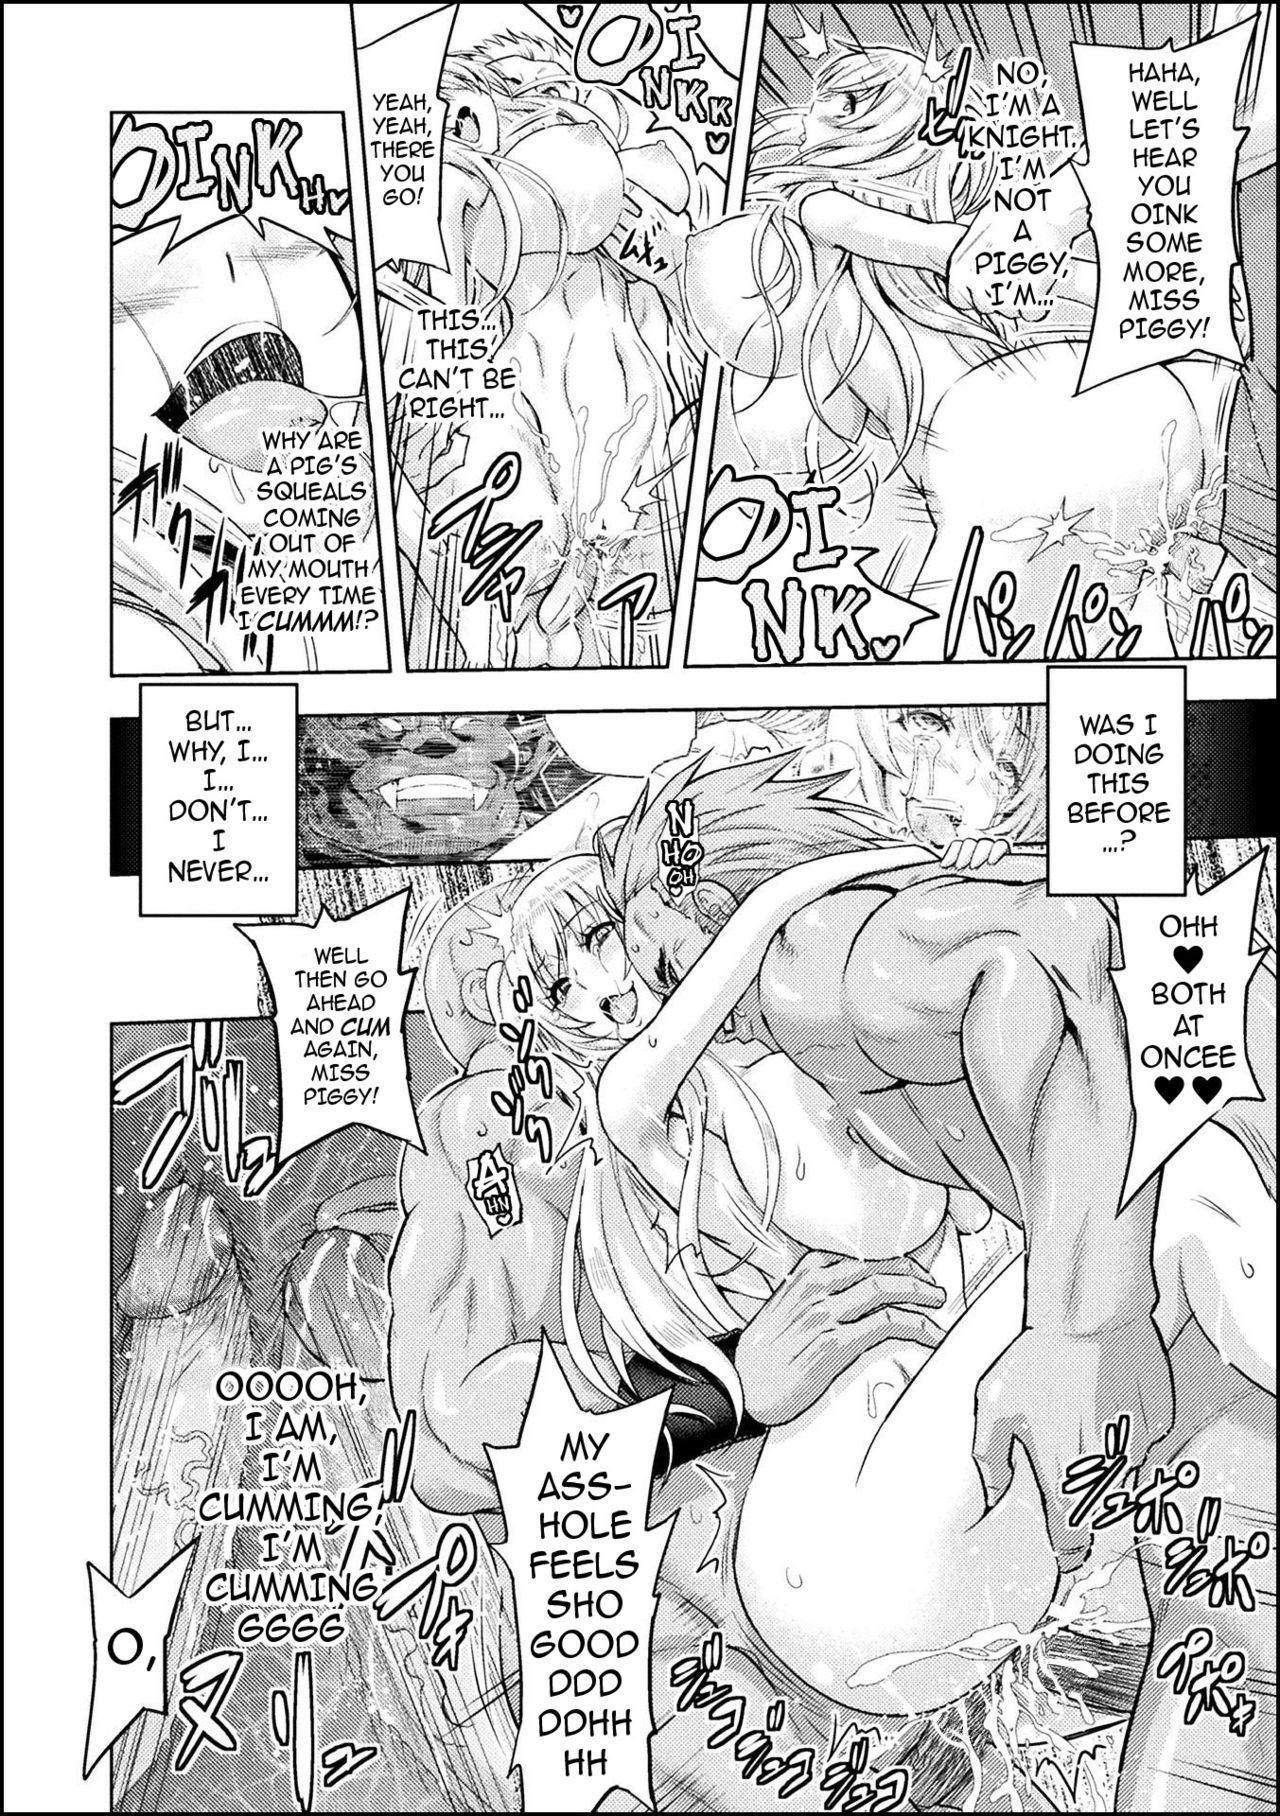 [Yamada Gogogo] Erona ~Orc no Inmon ni Okasareta Onna Kishi no Matsuro~ | Erona ~The Fall of a Beautiful Knight Cursed with the Lewd Mark of an Orc~ Ch. 1-6 [English] [darknight] [Decensored] [ongoing] 149